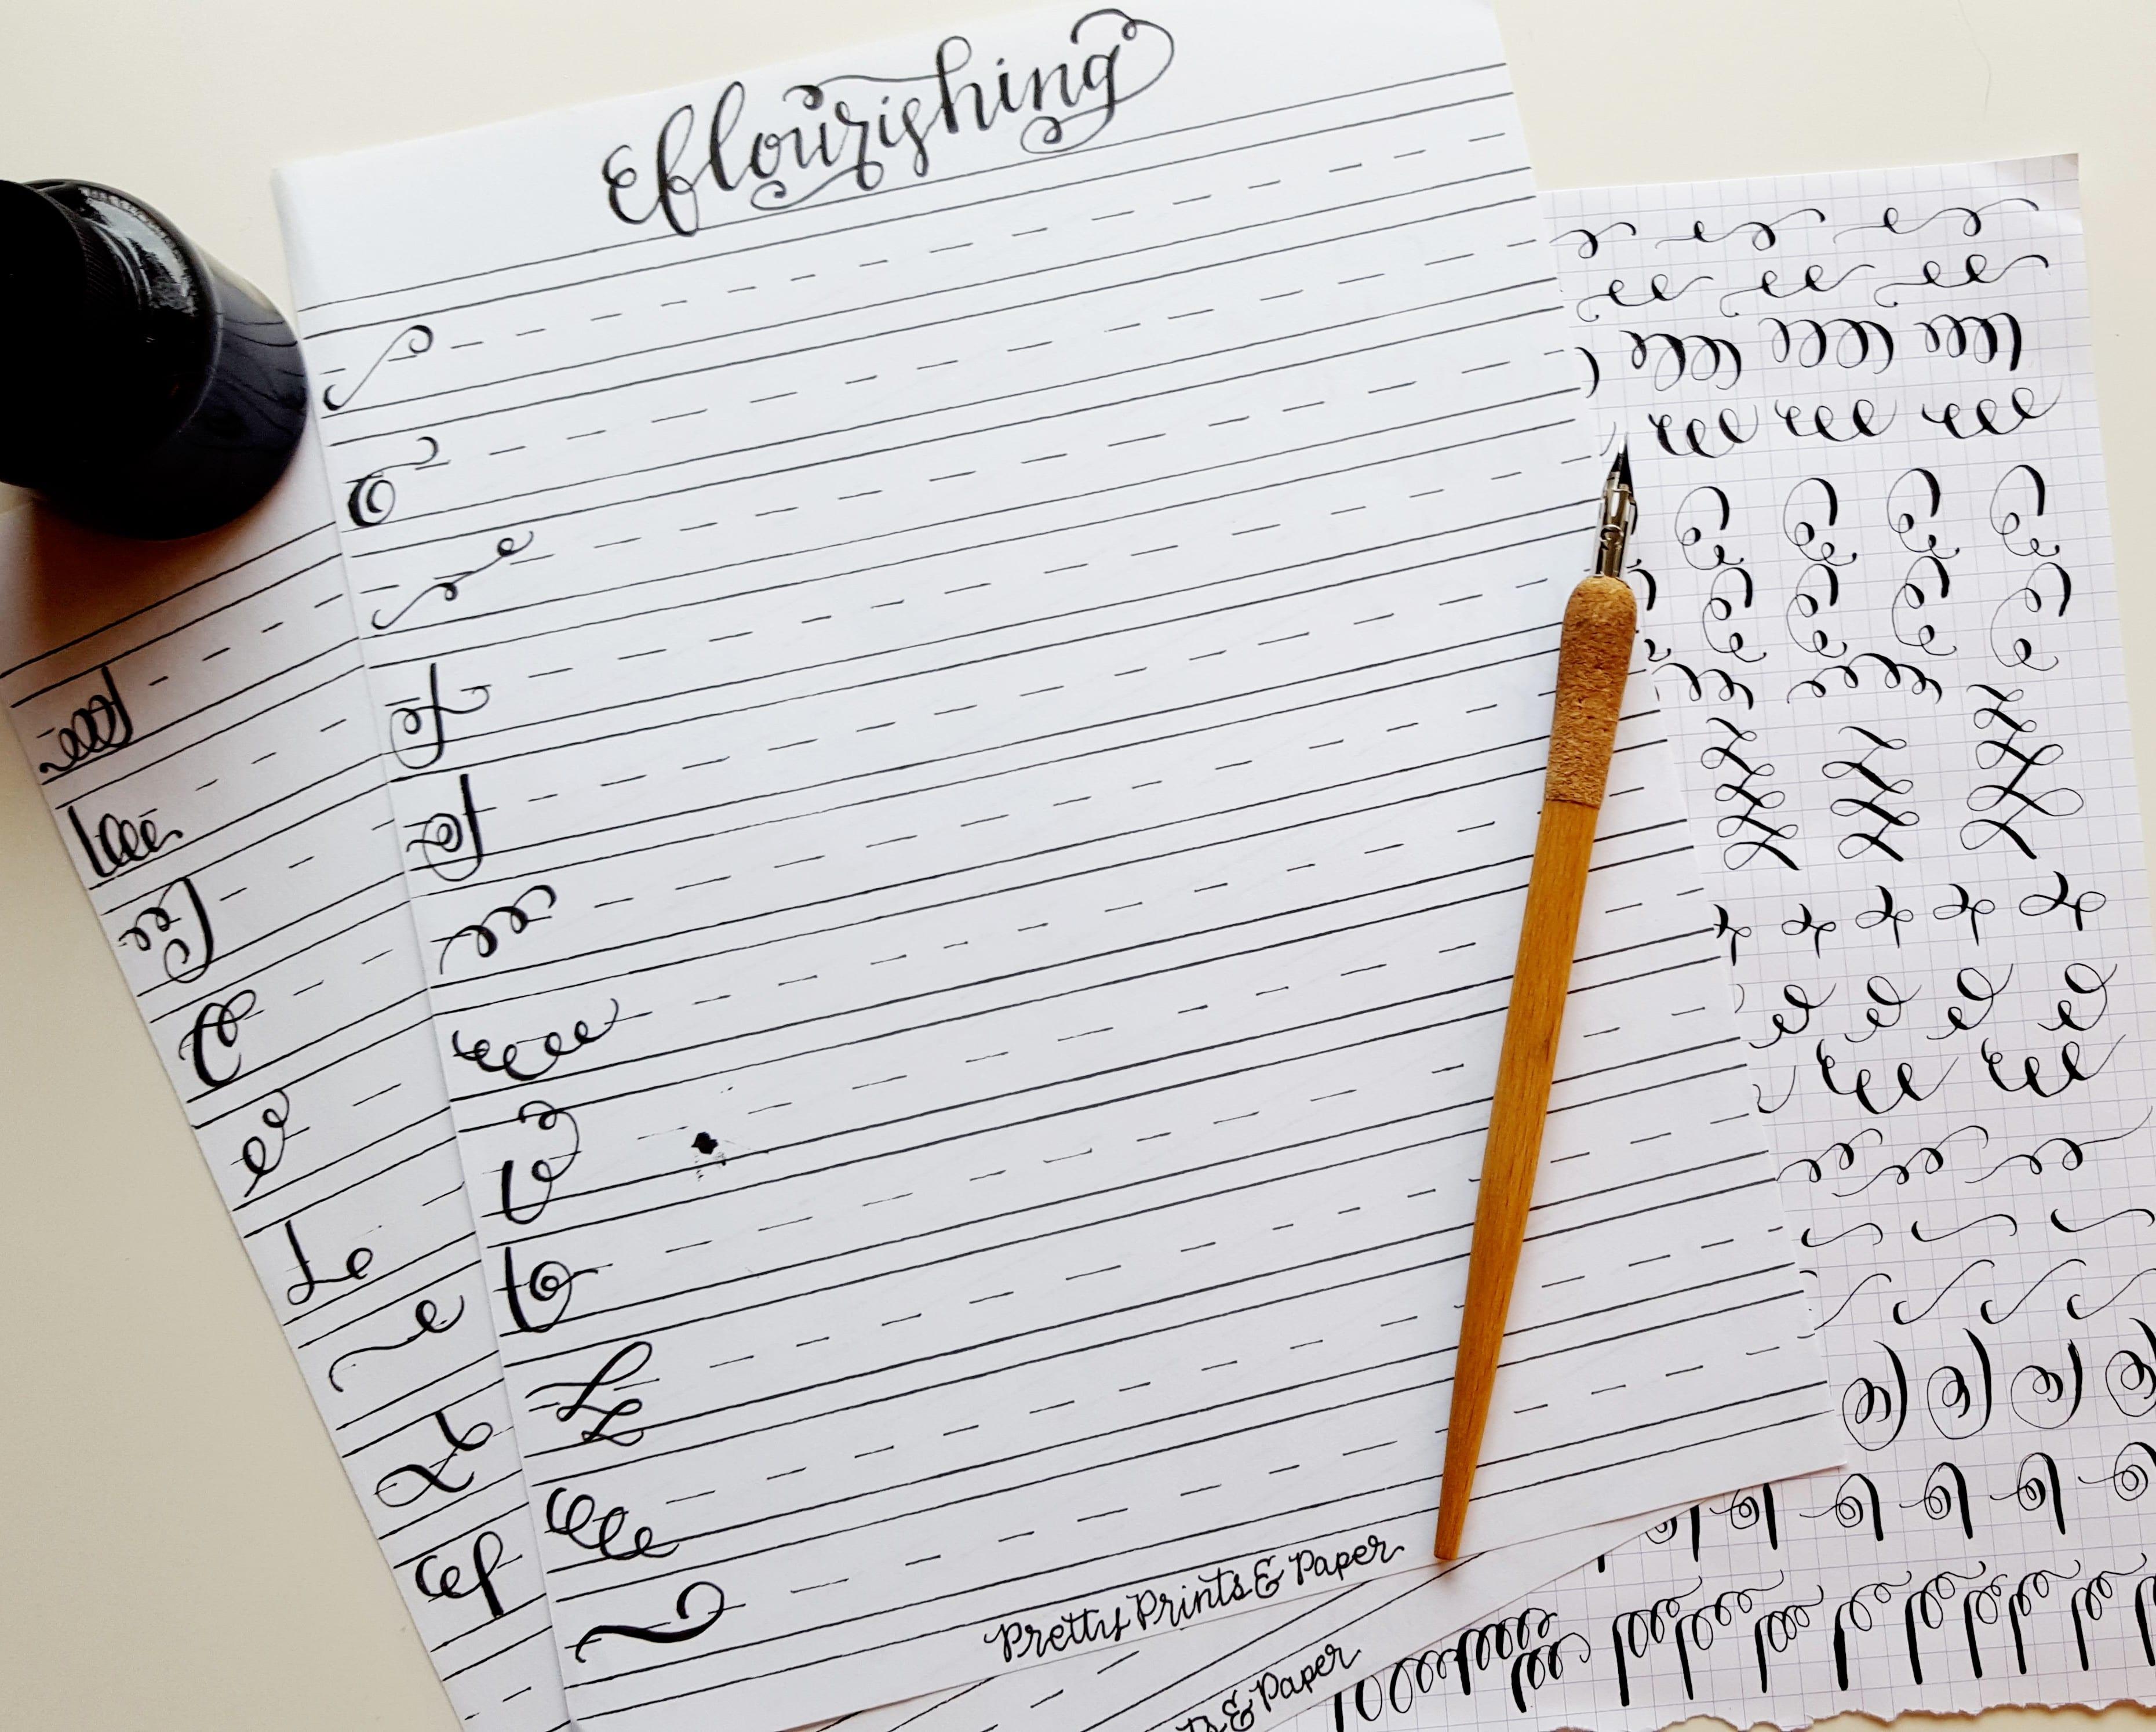 Download your own copy of my calligraphy flourish practice sheet // www.prettyprintsandpaper.com